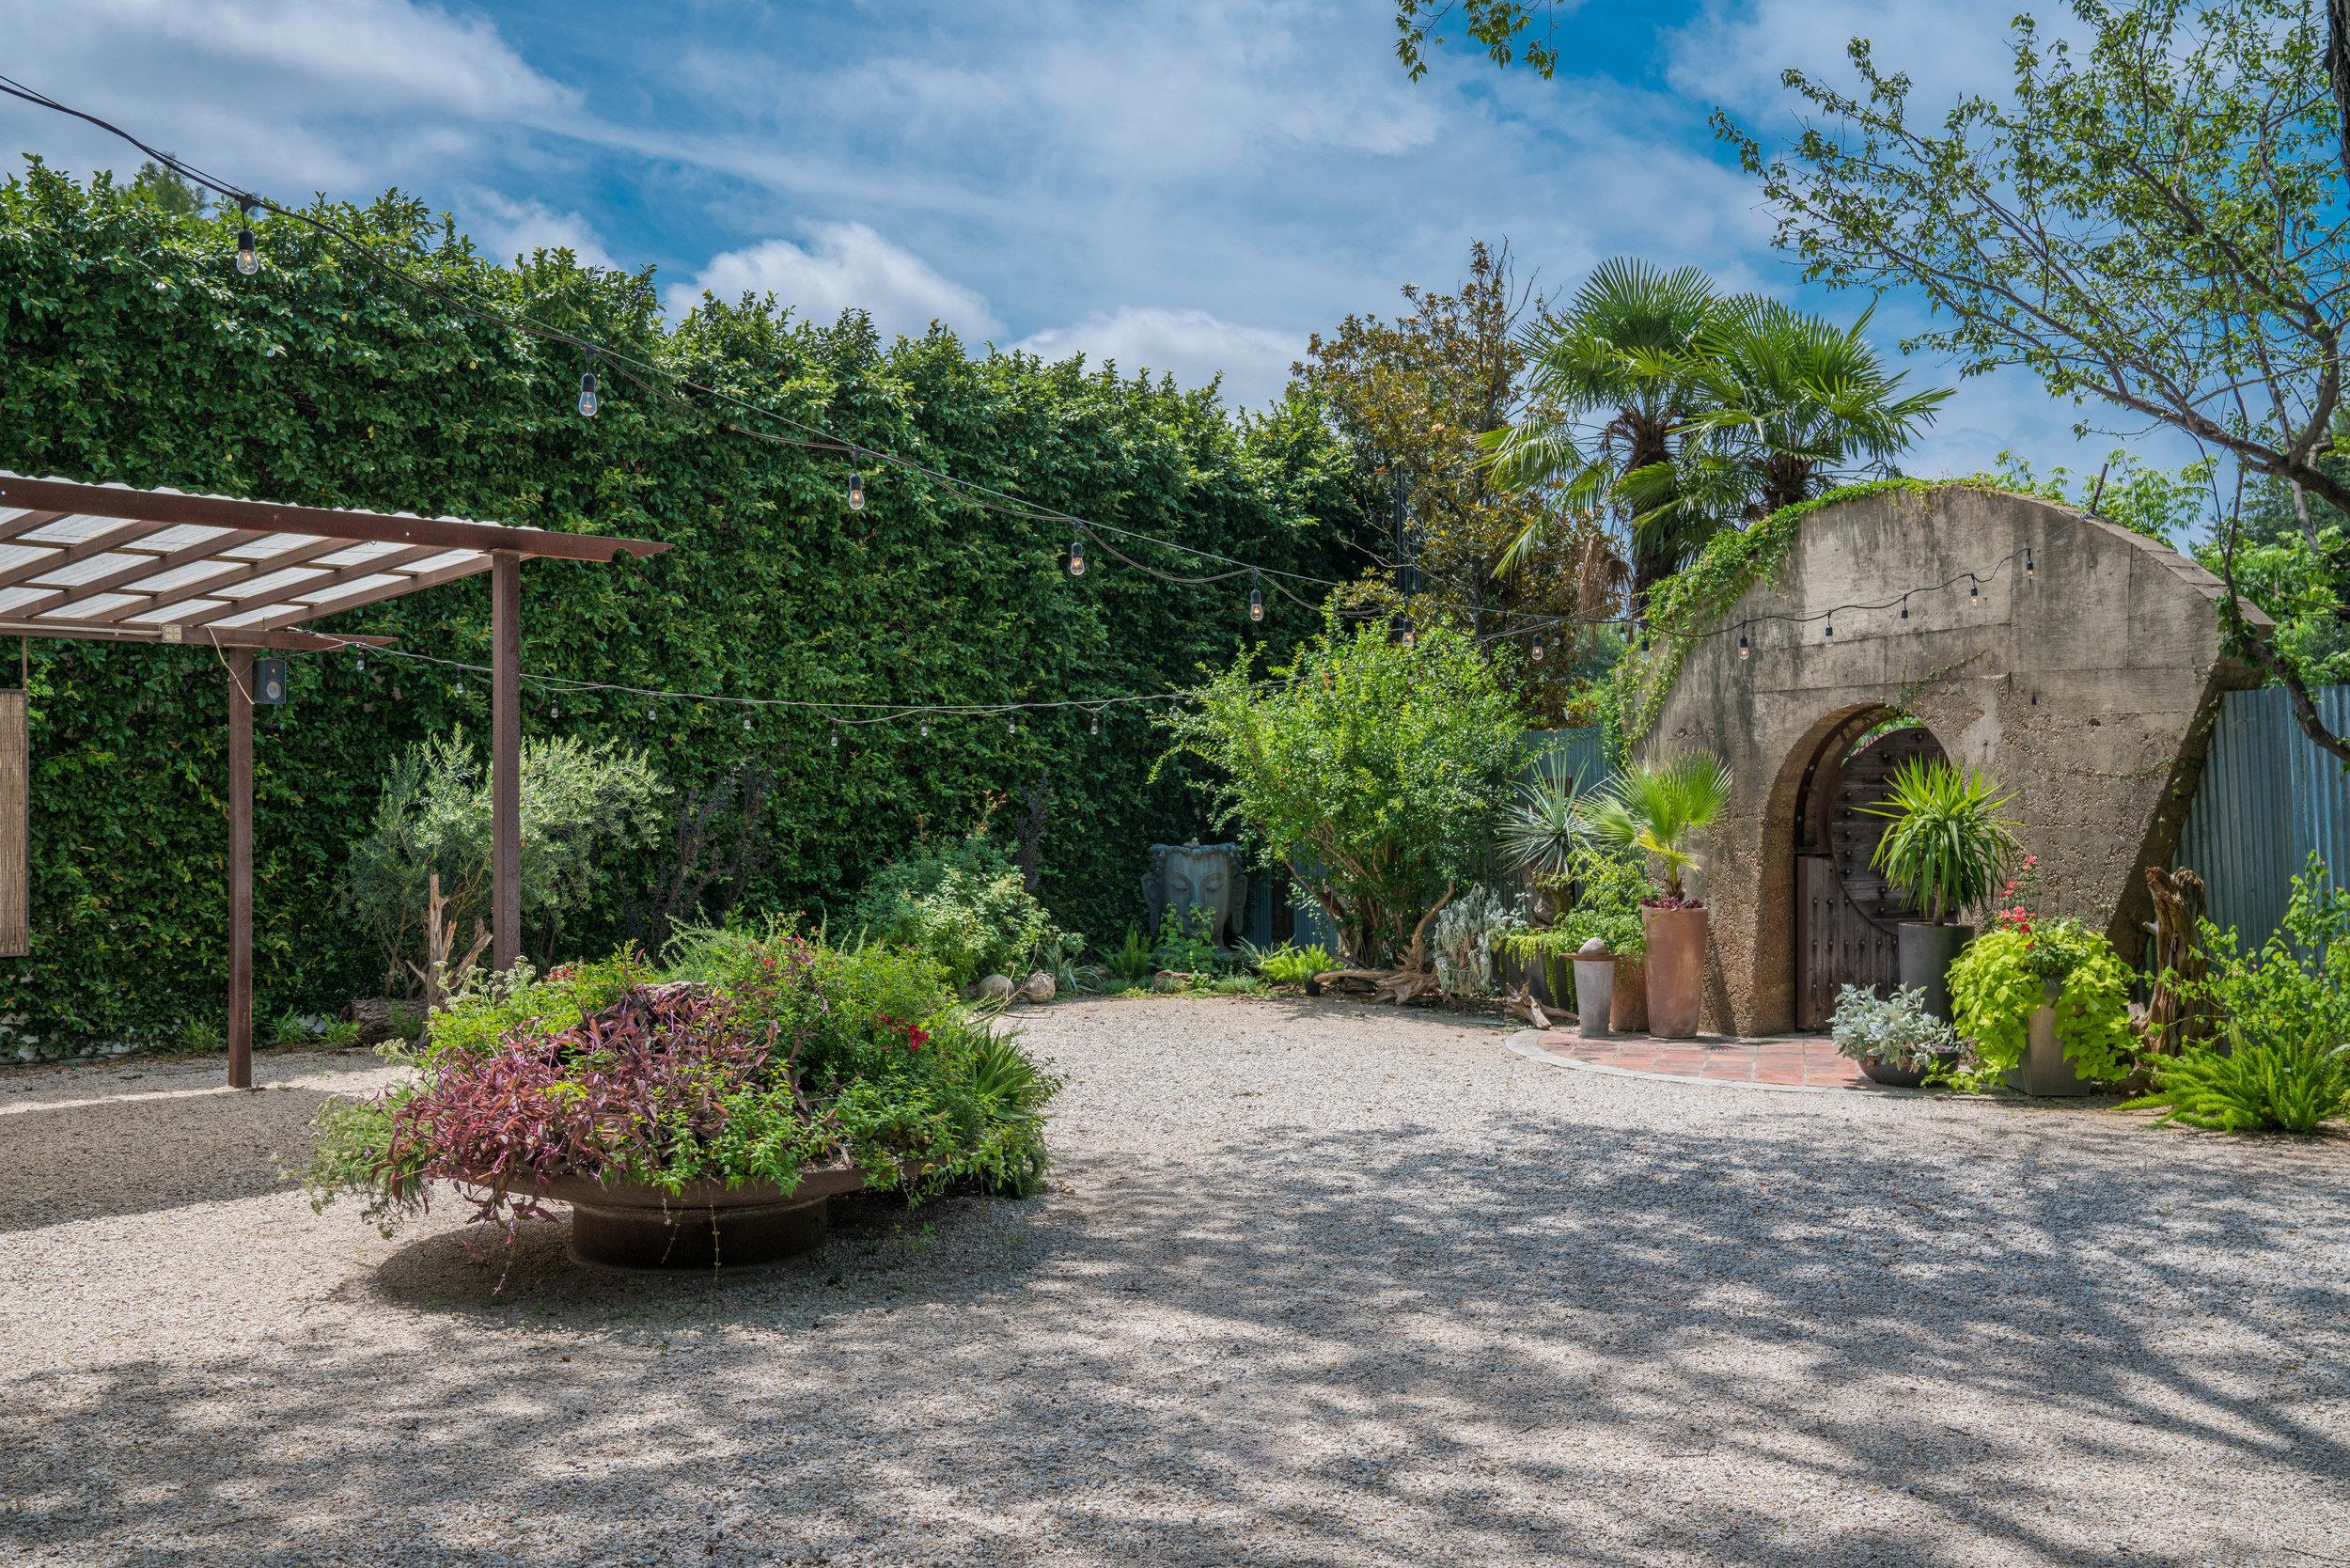 1102-East-Garden-June-2019-01447.jpg